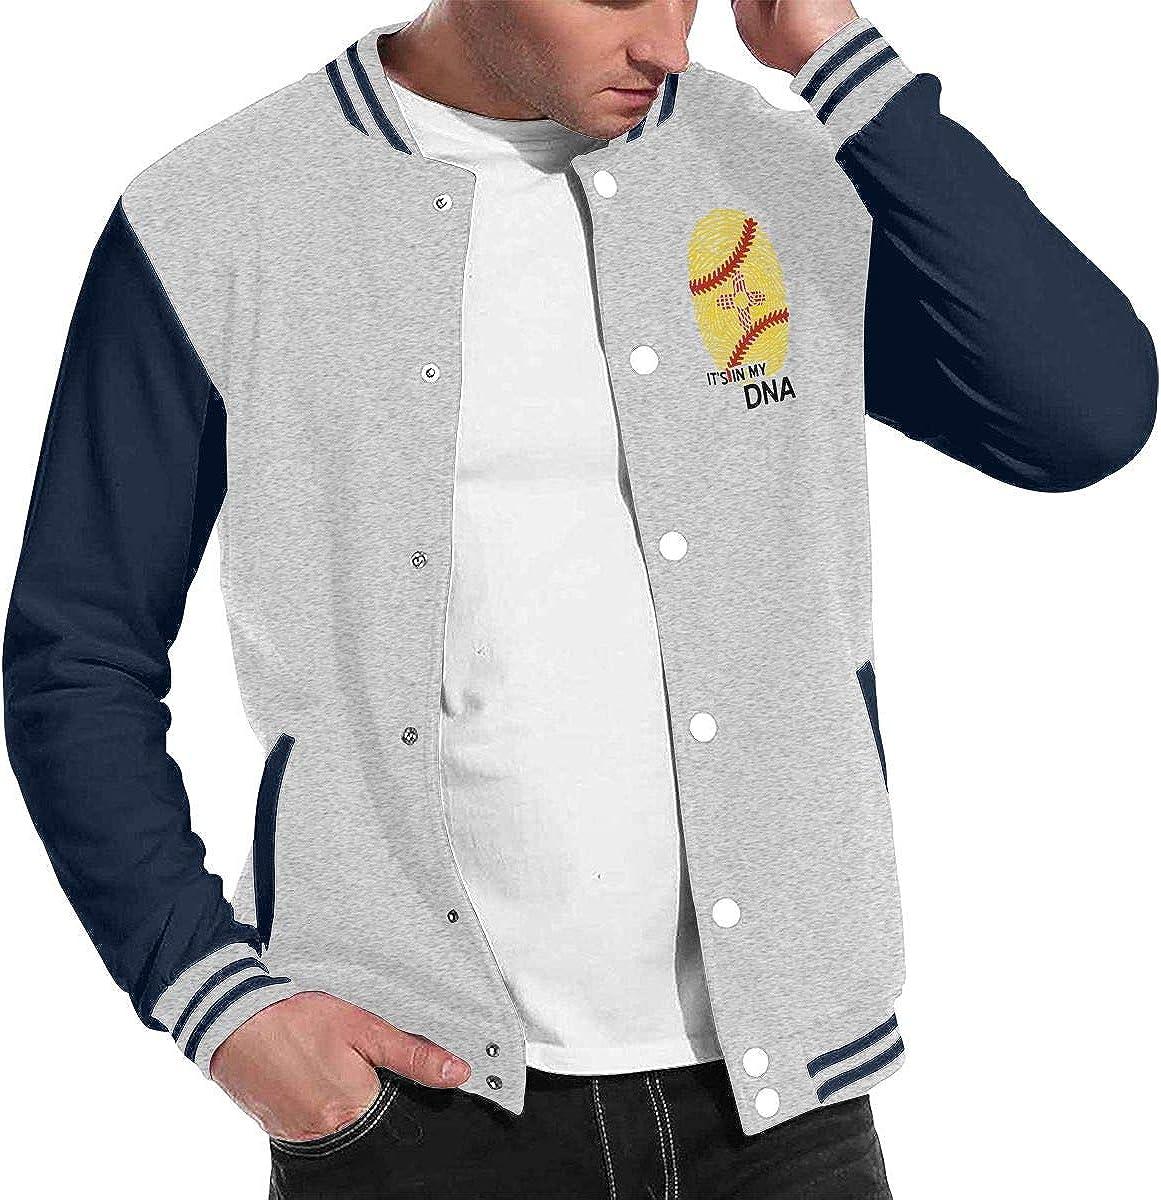 Men Women Varsity Premium Jacket Hoodie Sweatshirt New Mexico Flag Baseball in My DNA Baseball Jacket Uniform